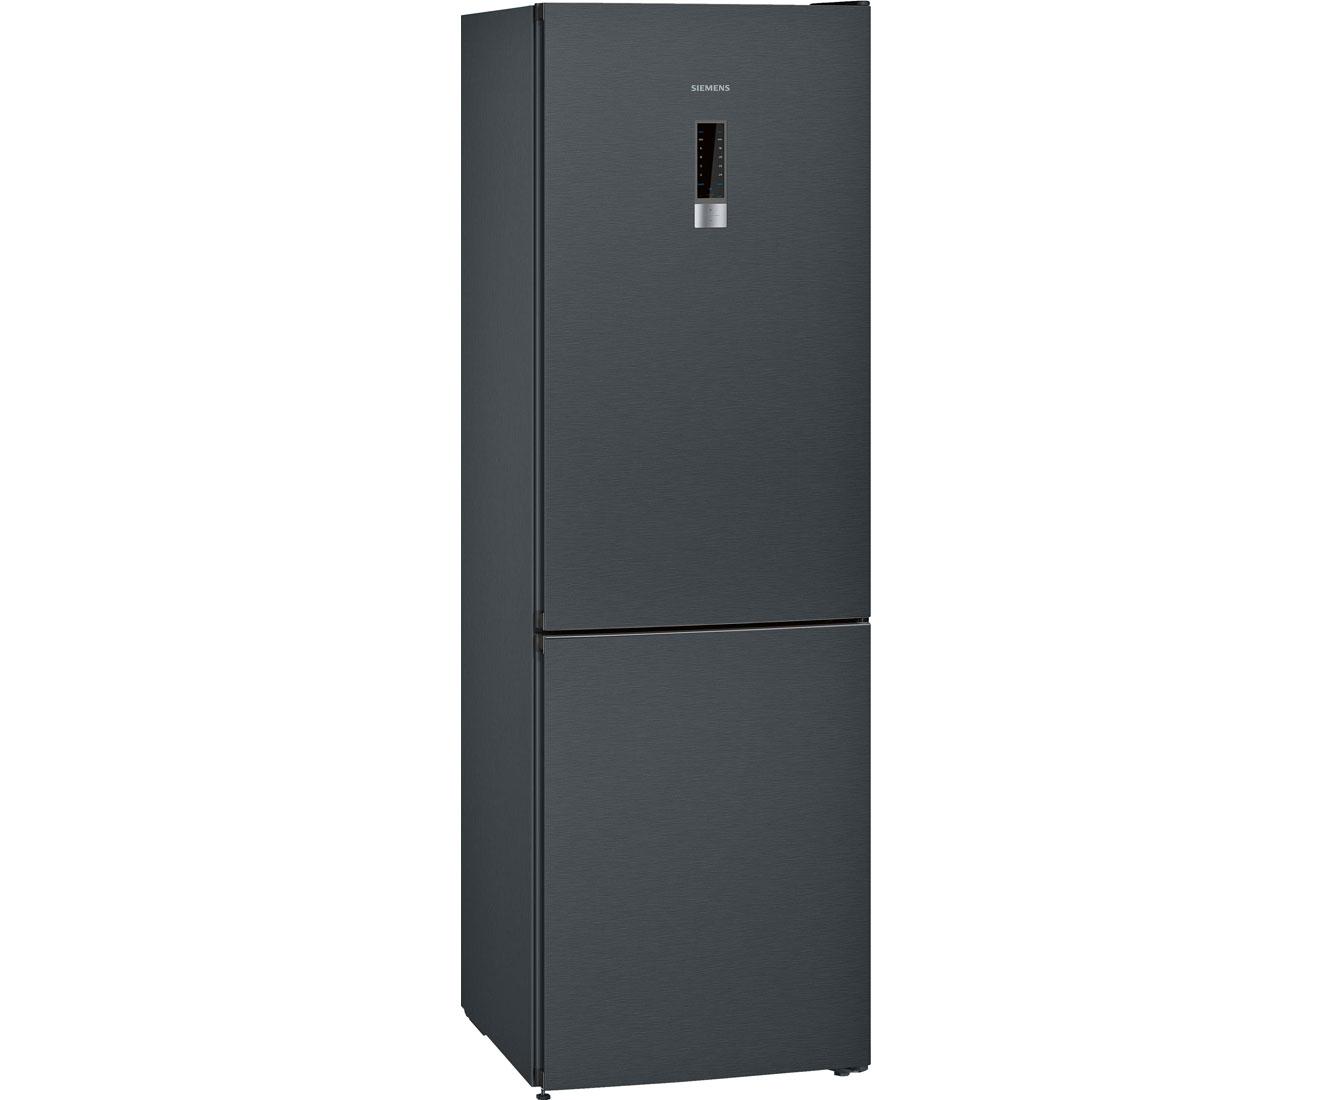 Siemens Kombi Kühlschrank : Siemens iq kg nxx a kühlschrank schwarz edelstahl a